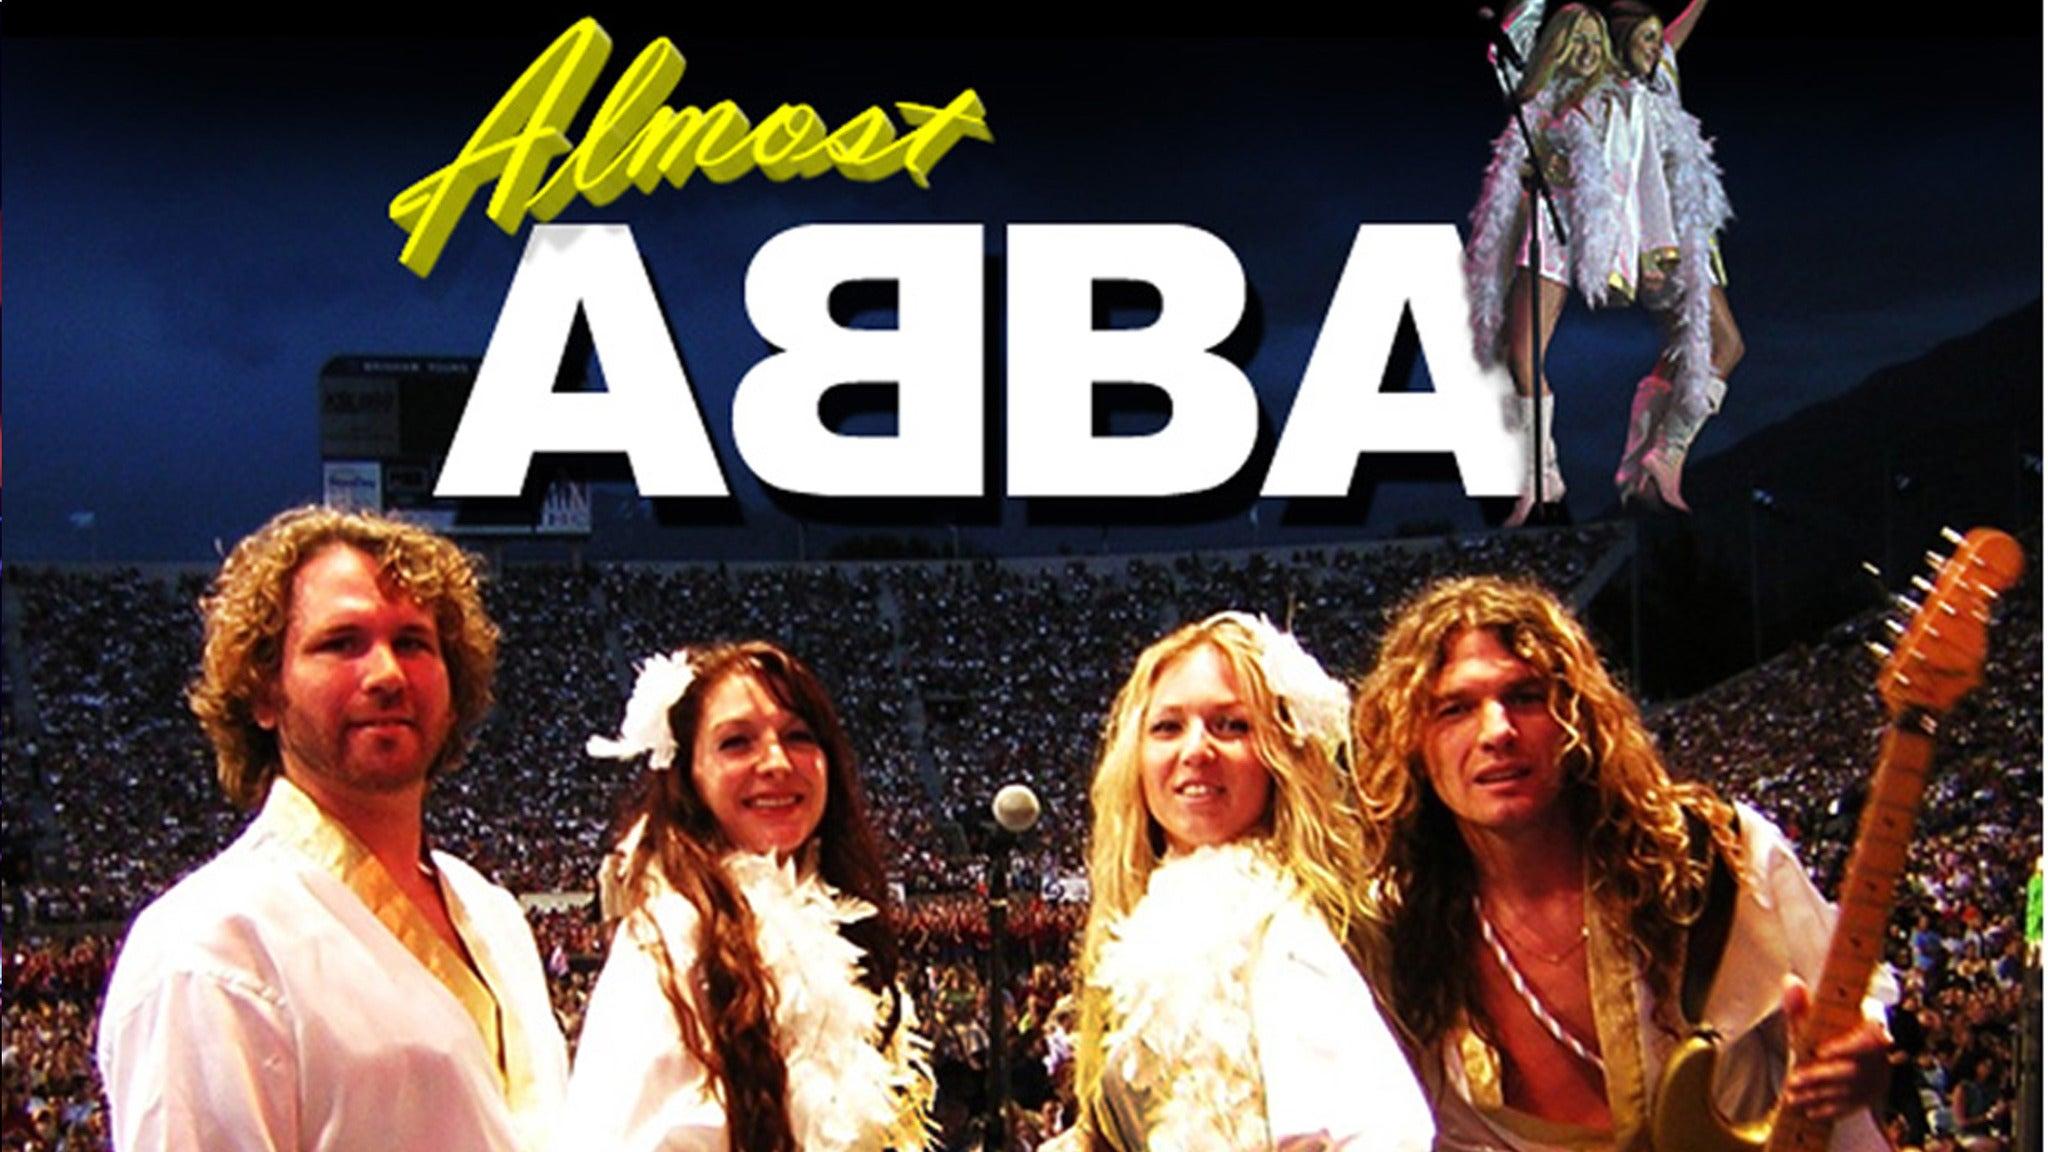 Almost Abba